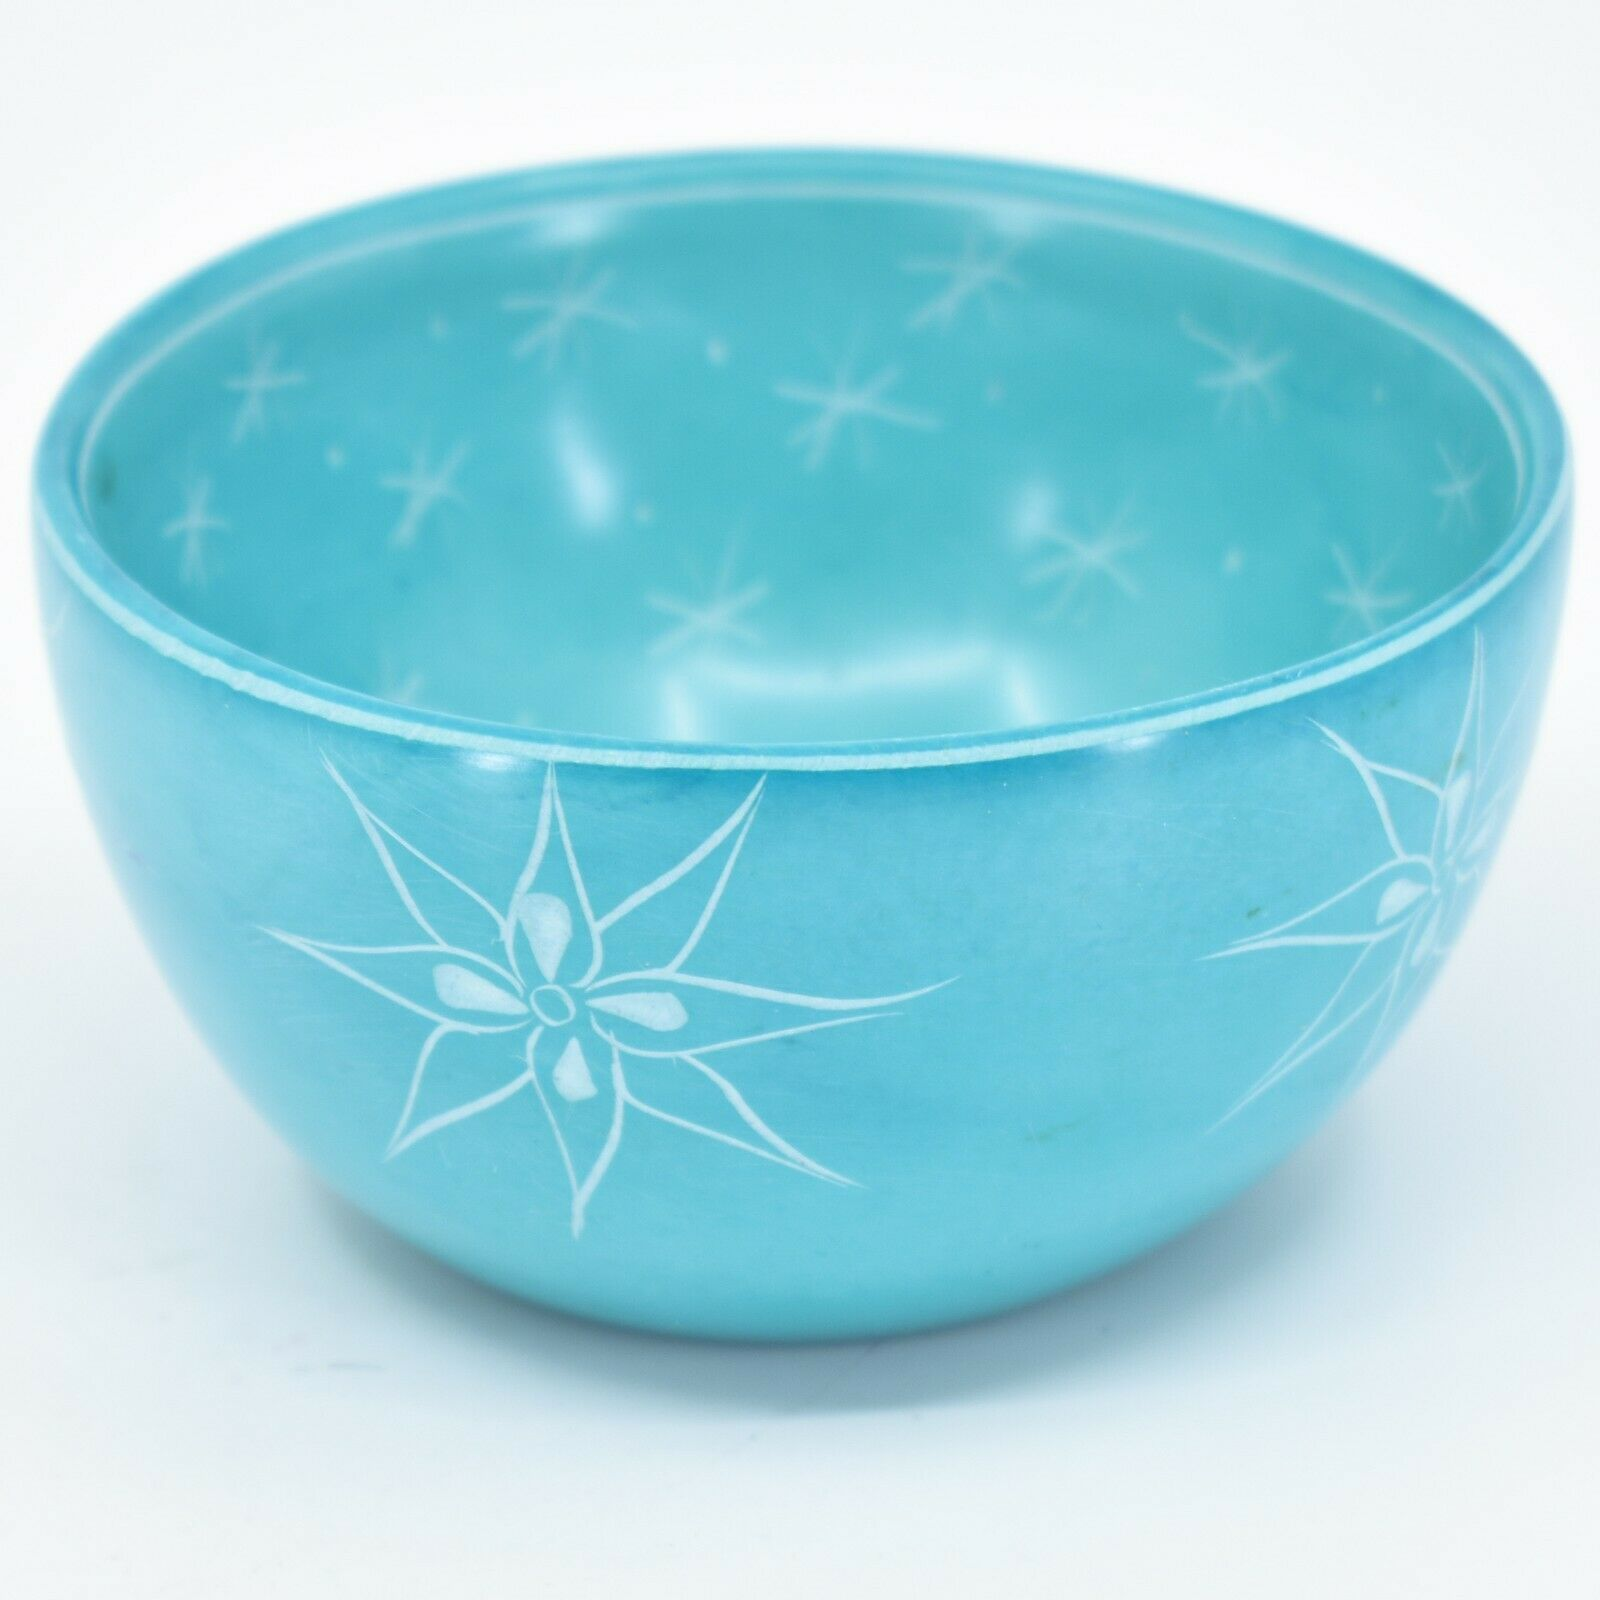 Tabaka Chigware Handmade Soapstone Blue Flower & Star Design Trinket Bowl Kenya